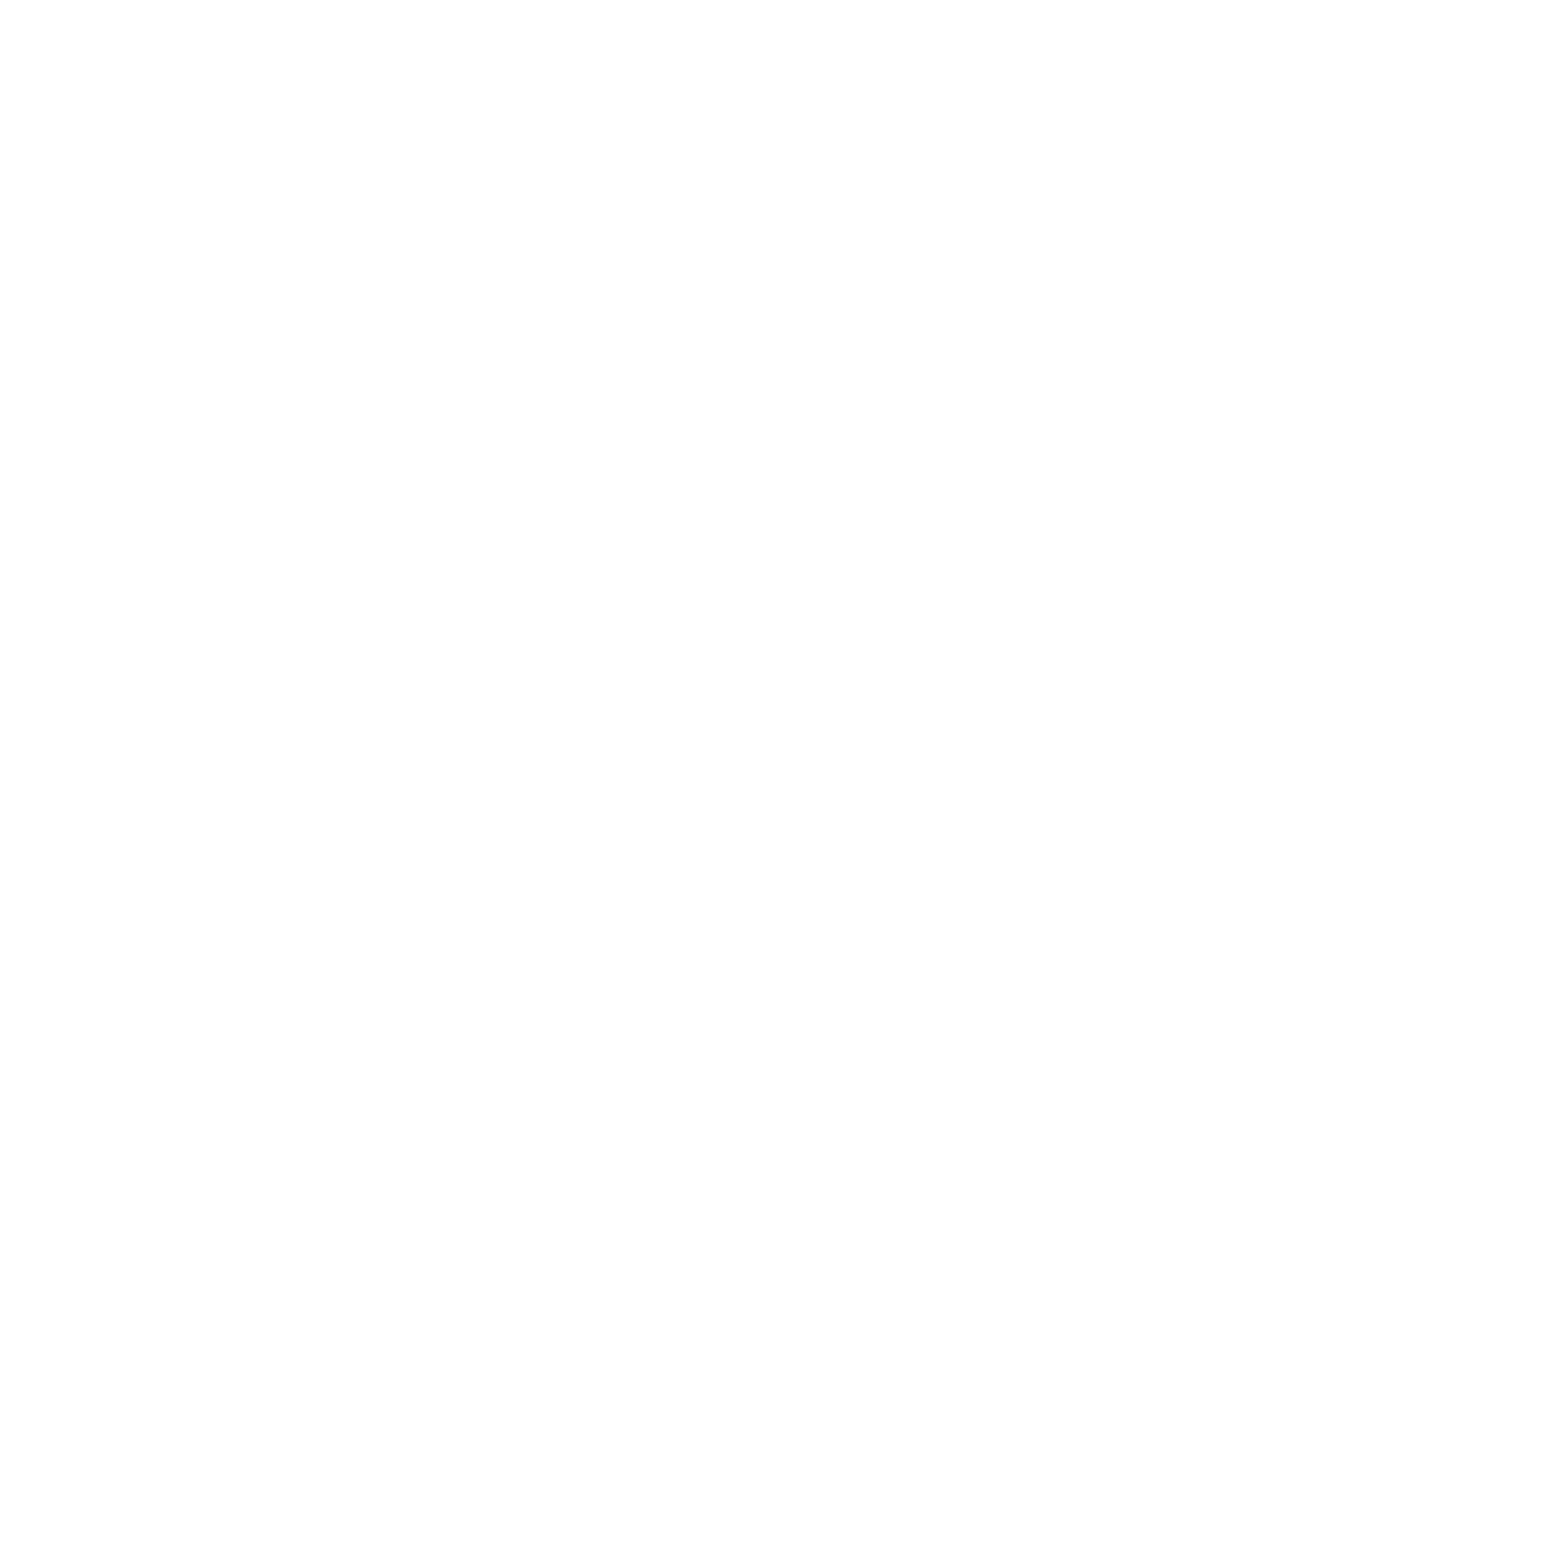 Workshop icone - Wireframe